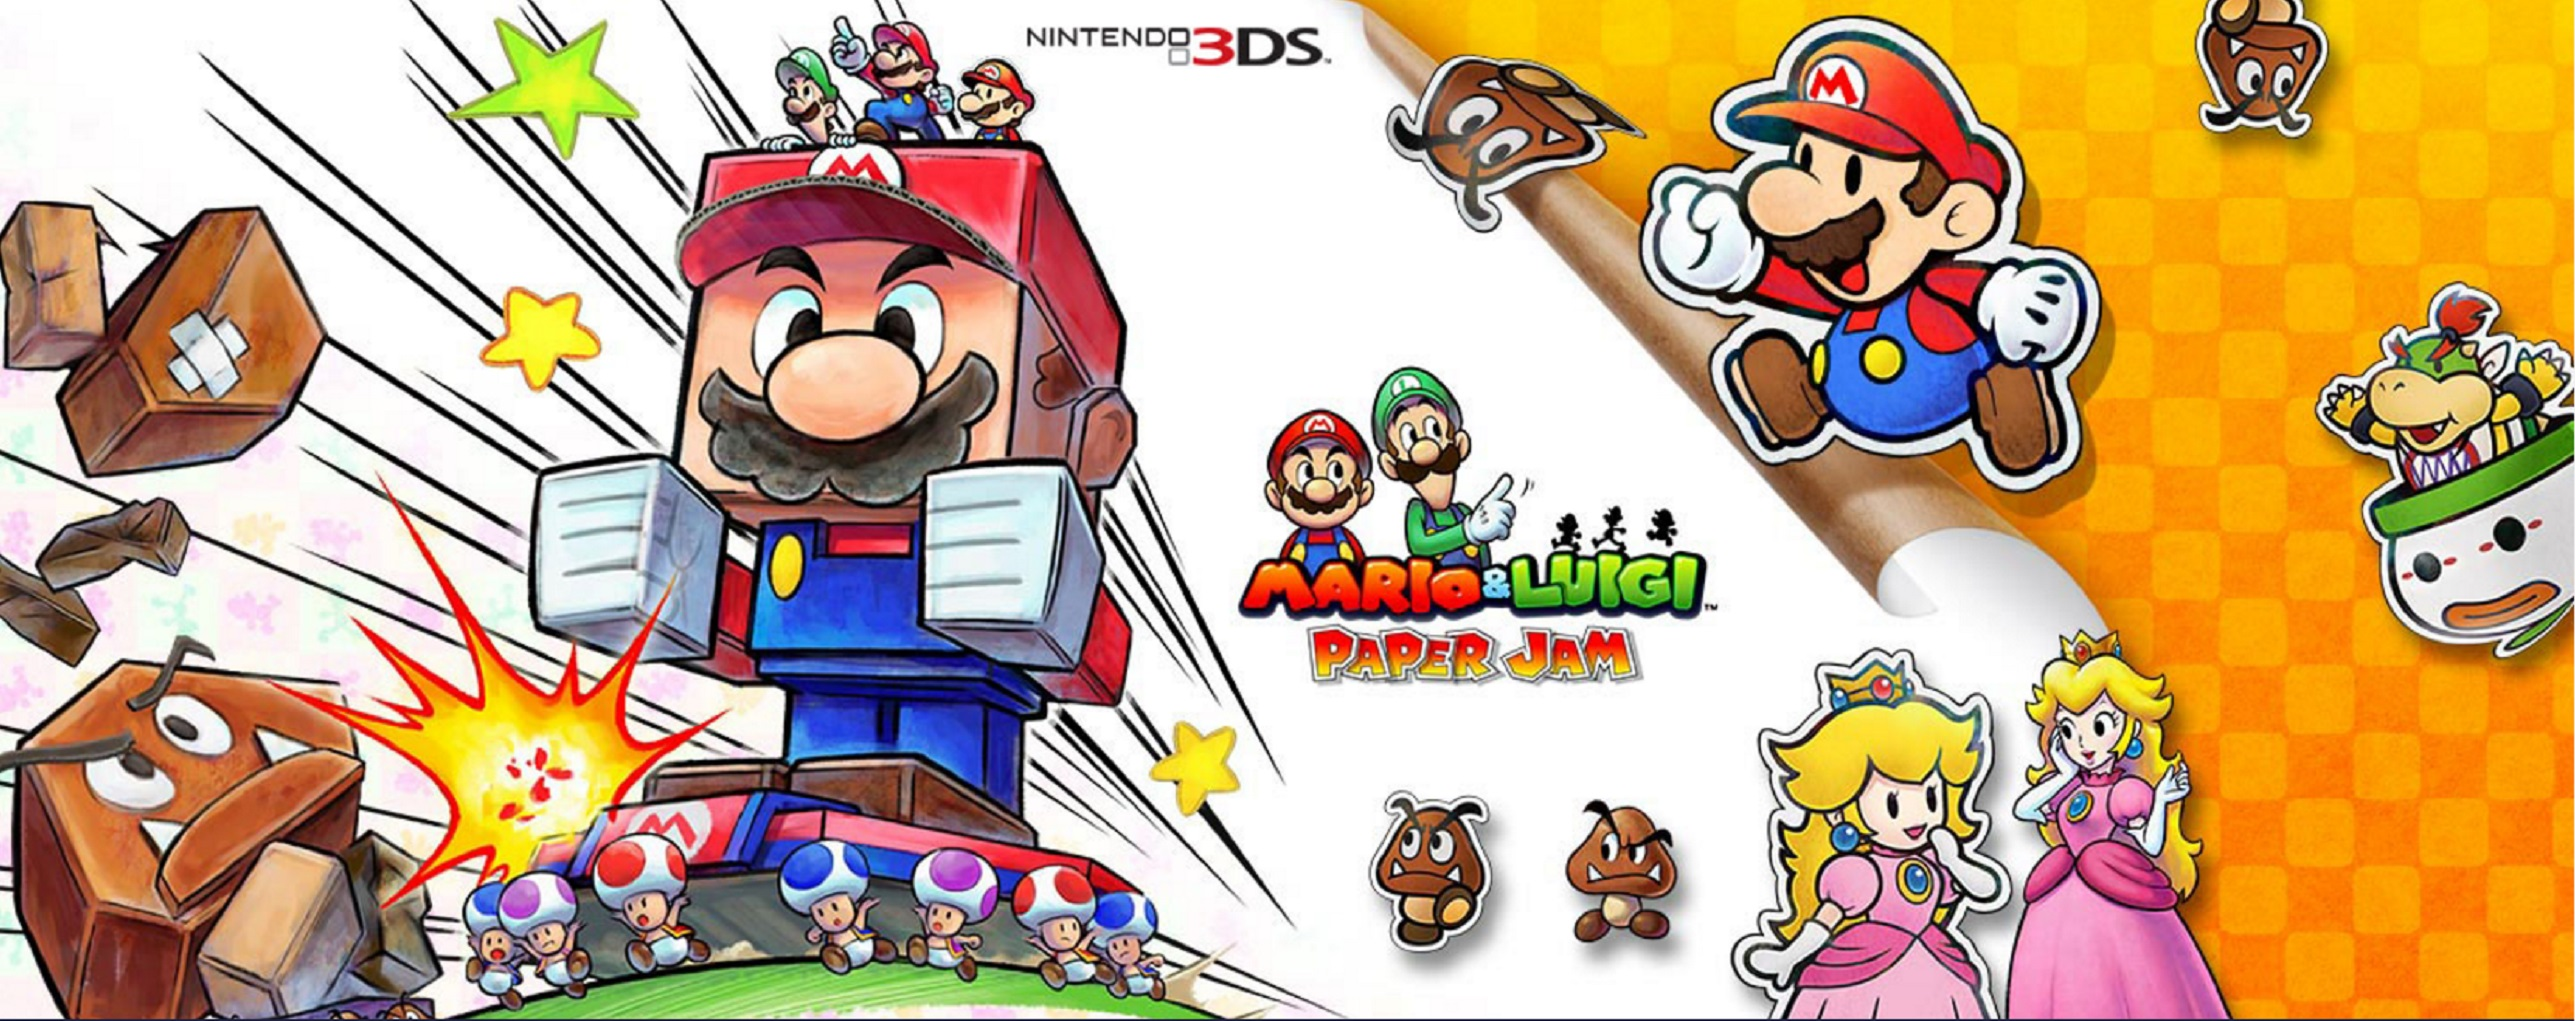 Mario Luigi Paper Jam Art Id 83935 Art Abyss